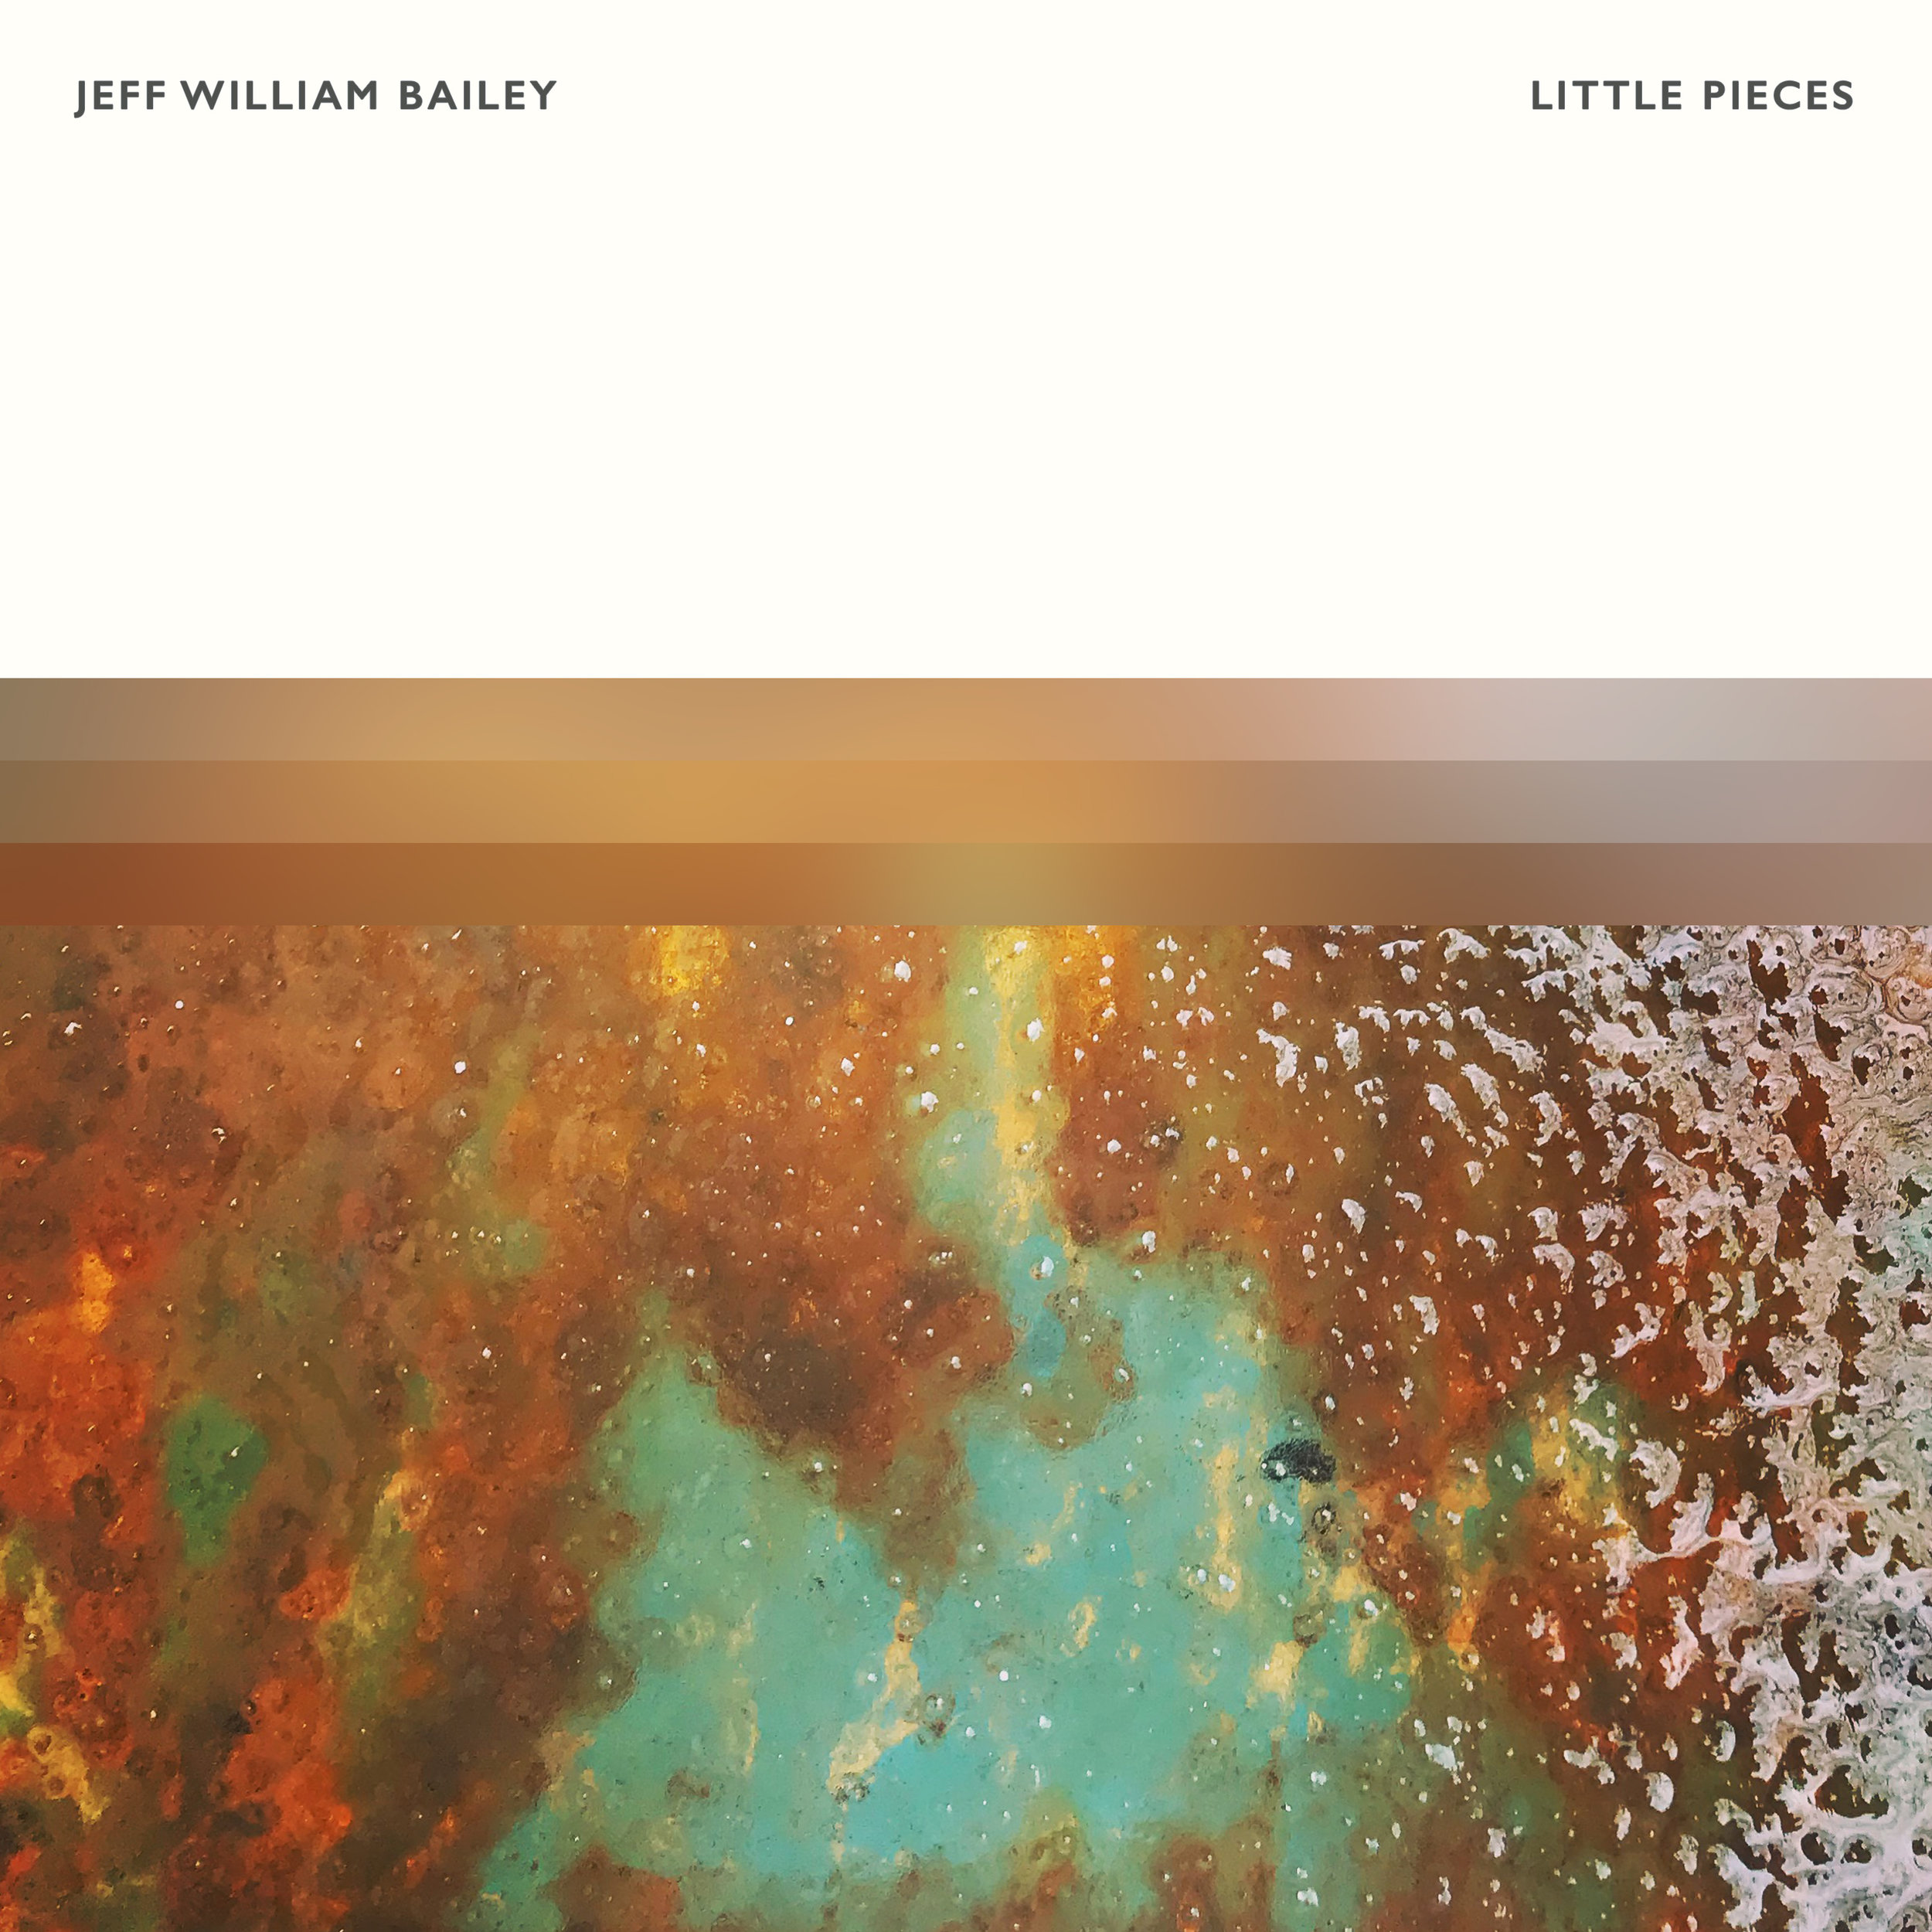 Jeff William Bailey - Little Pieces